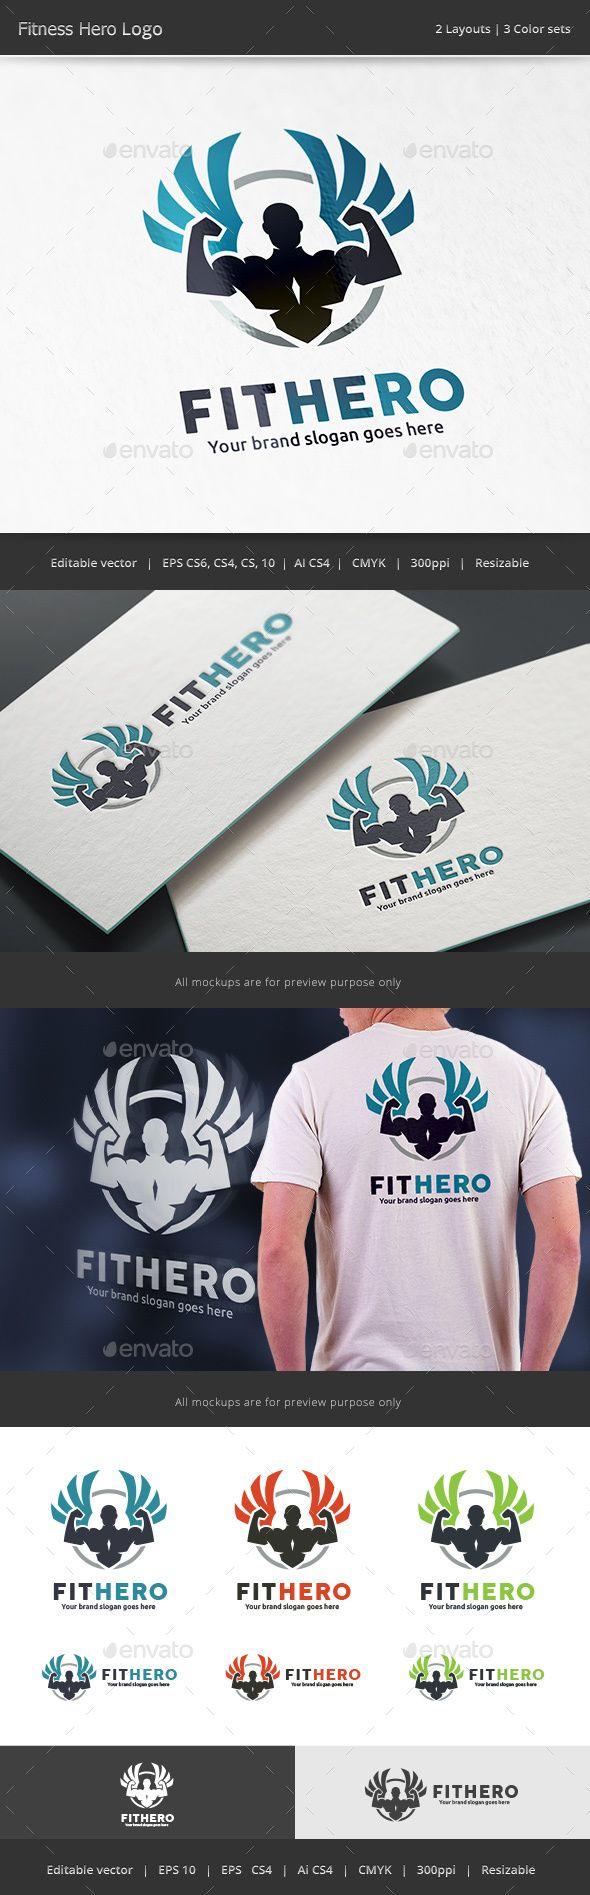 Fitness Hero  Logo Design Template Vector #logotype Download it here: http://graphicriver.net/item/fitness-hero-logo/16079679?s_rank=2?ref=nesto